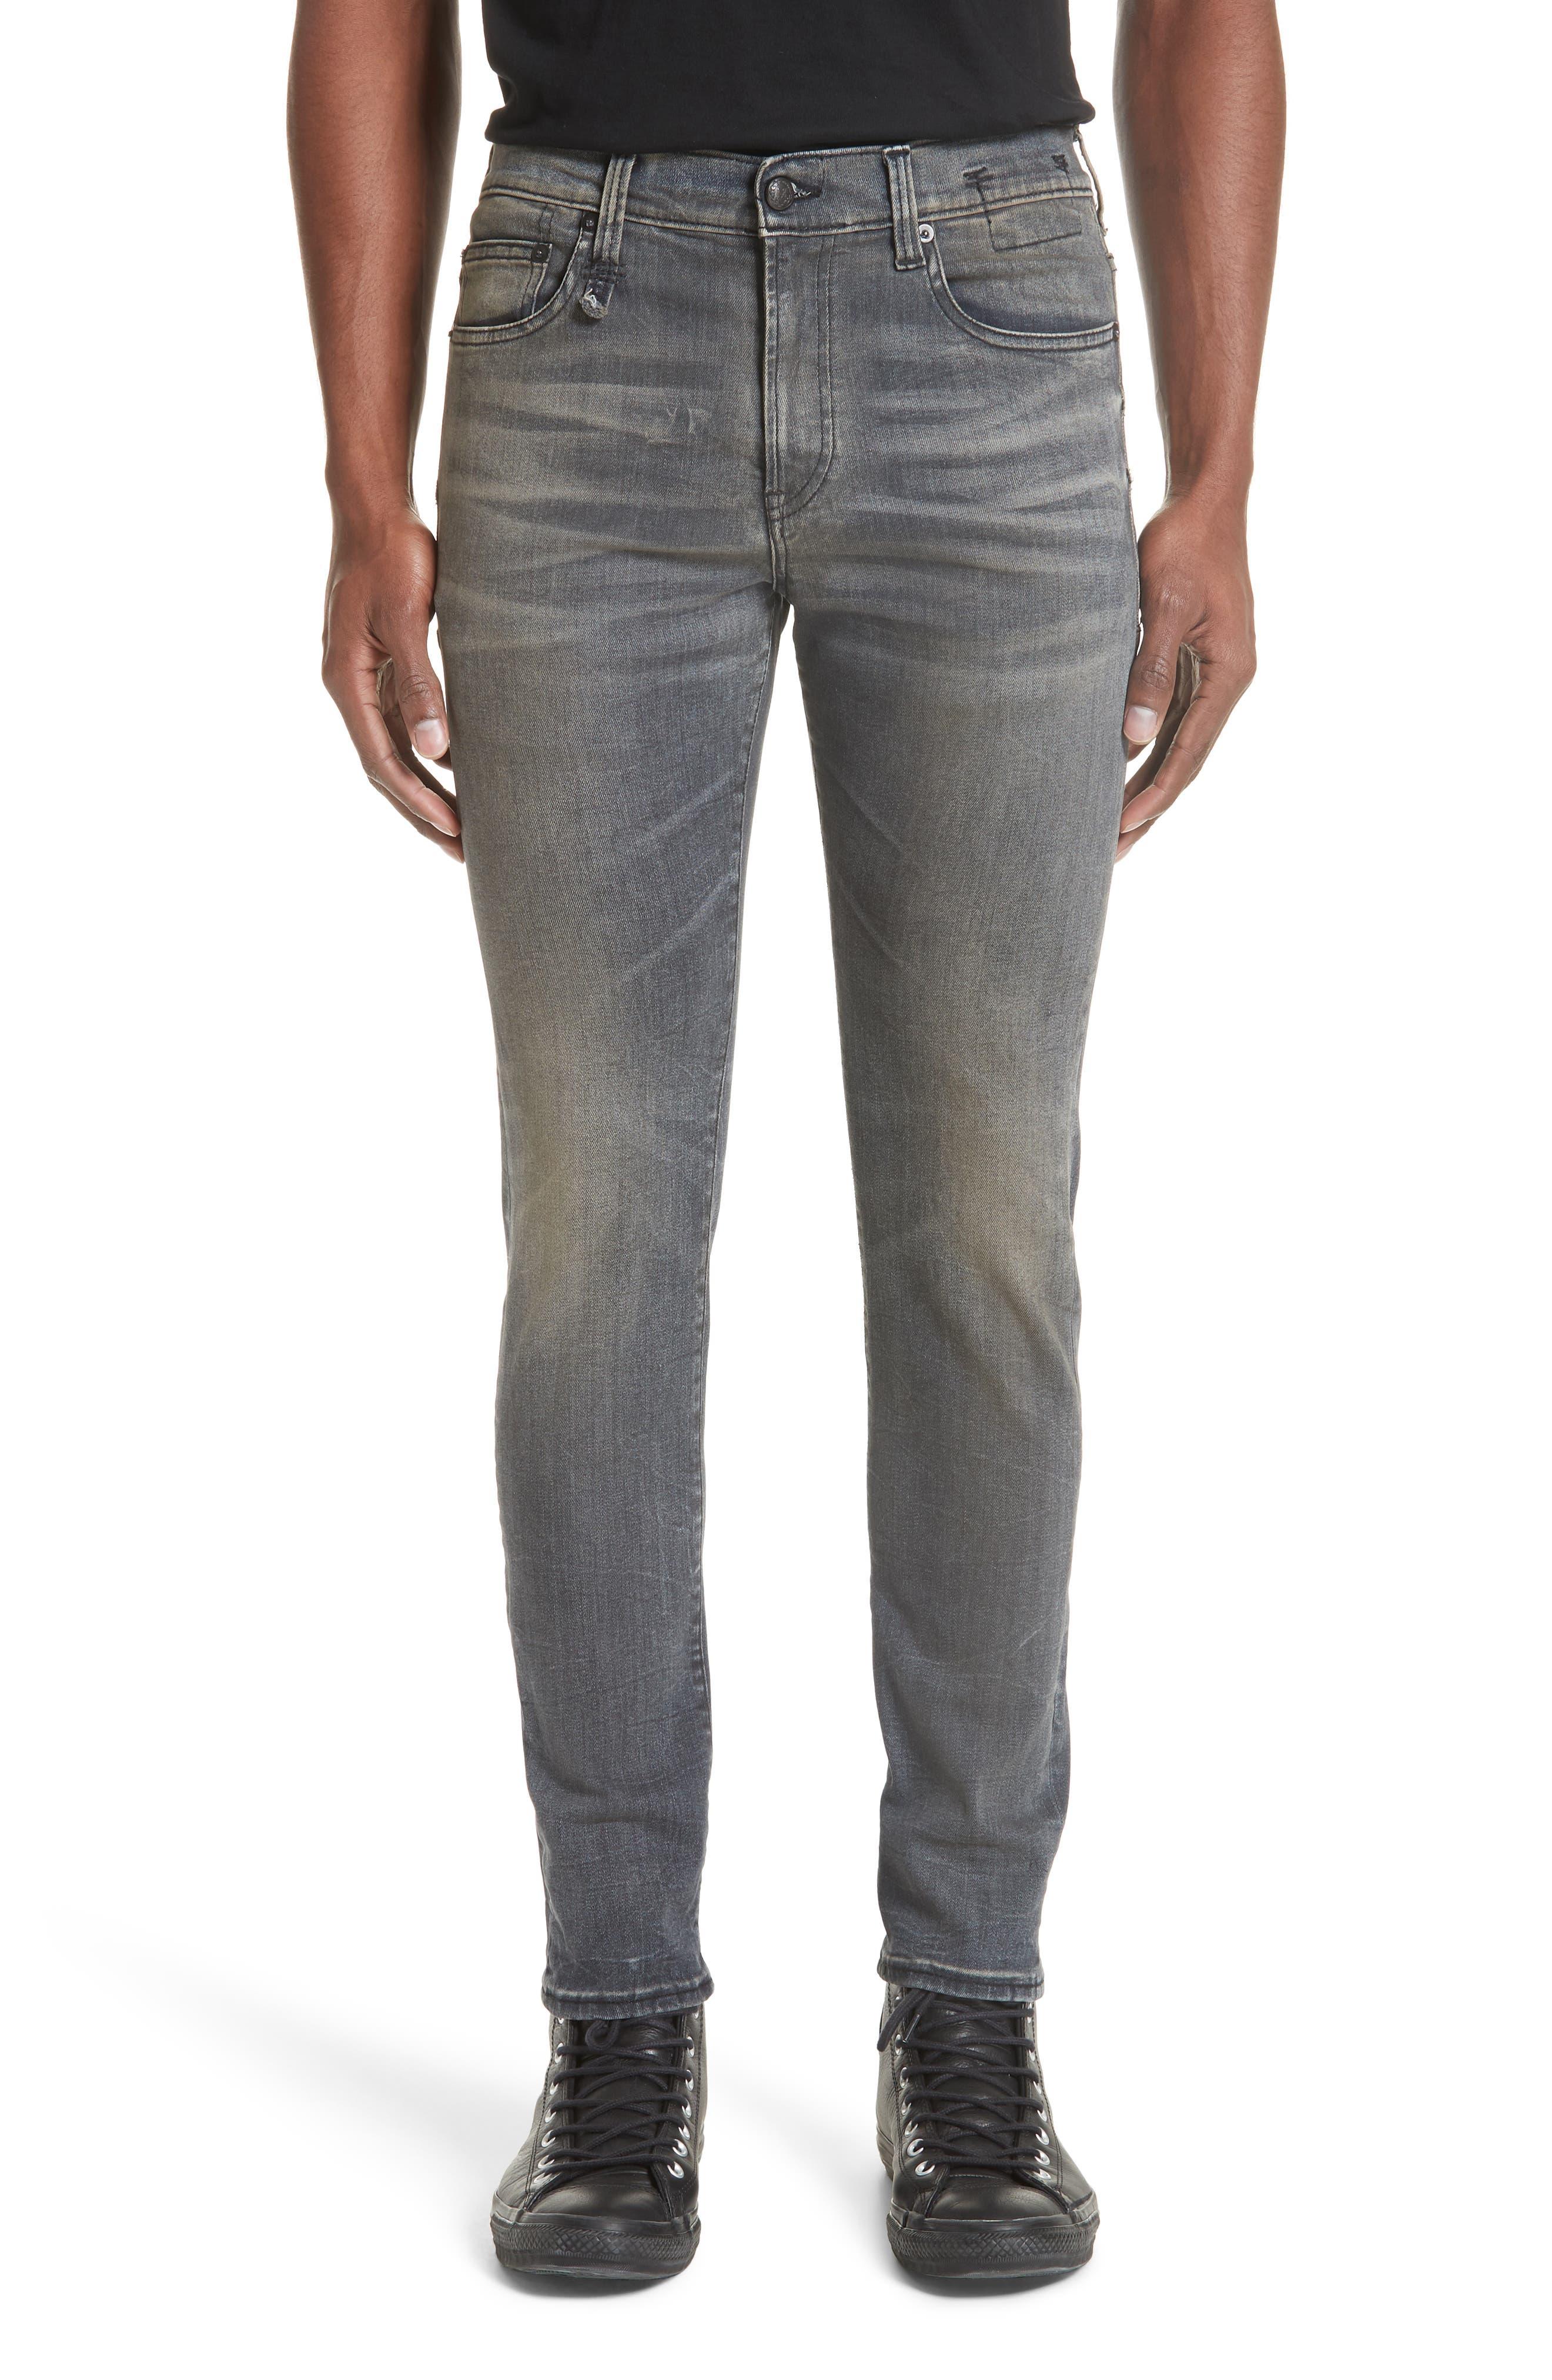 Skate Slim Fit Jeans,                             Main thumbnail 1, color,                             001